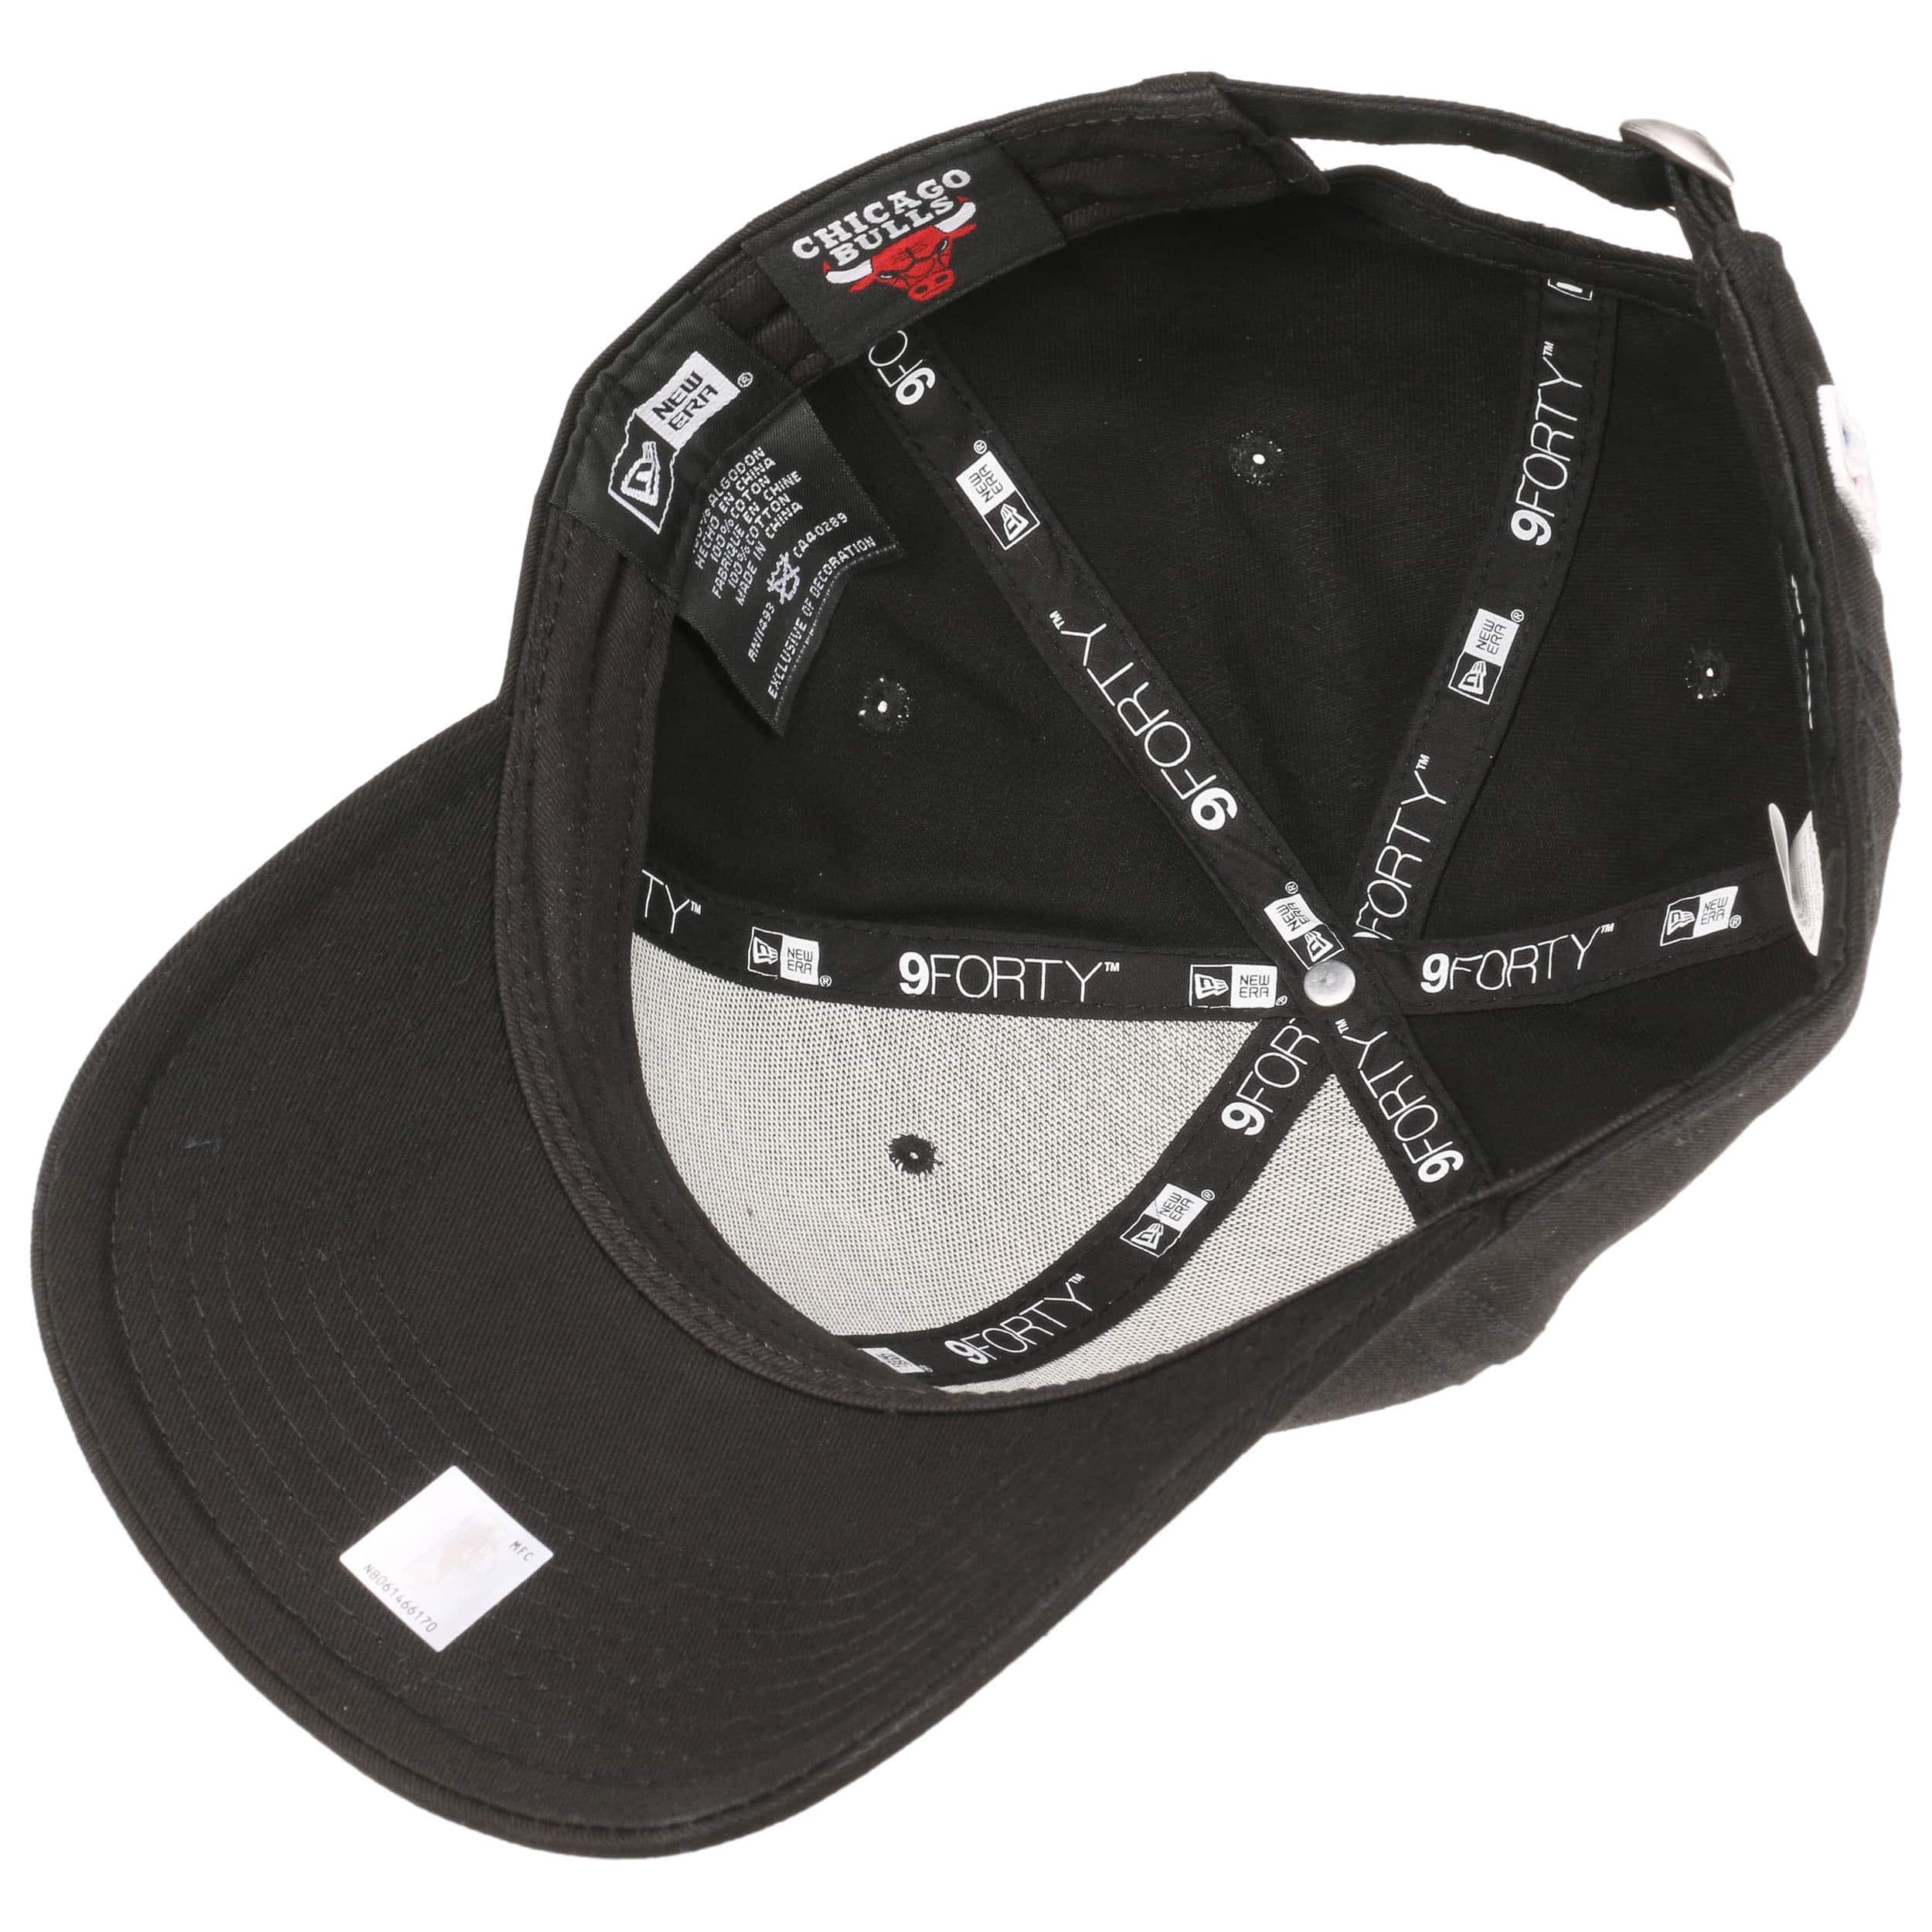 Gorra 9Forty Chicago Bulls by New Era - Gorras - sombreroshop.es bdd9f421302